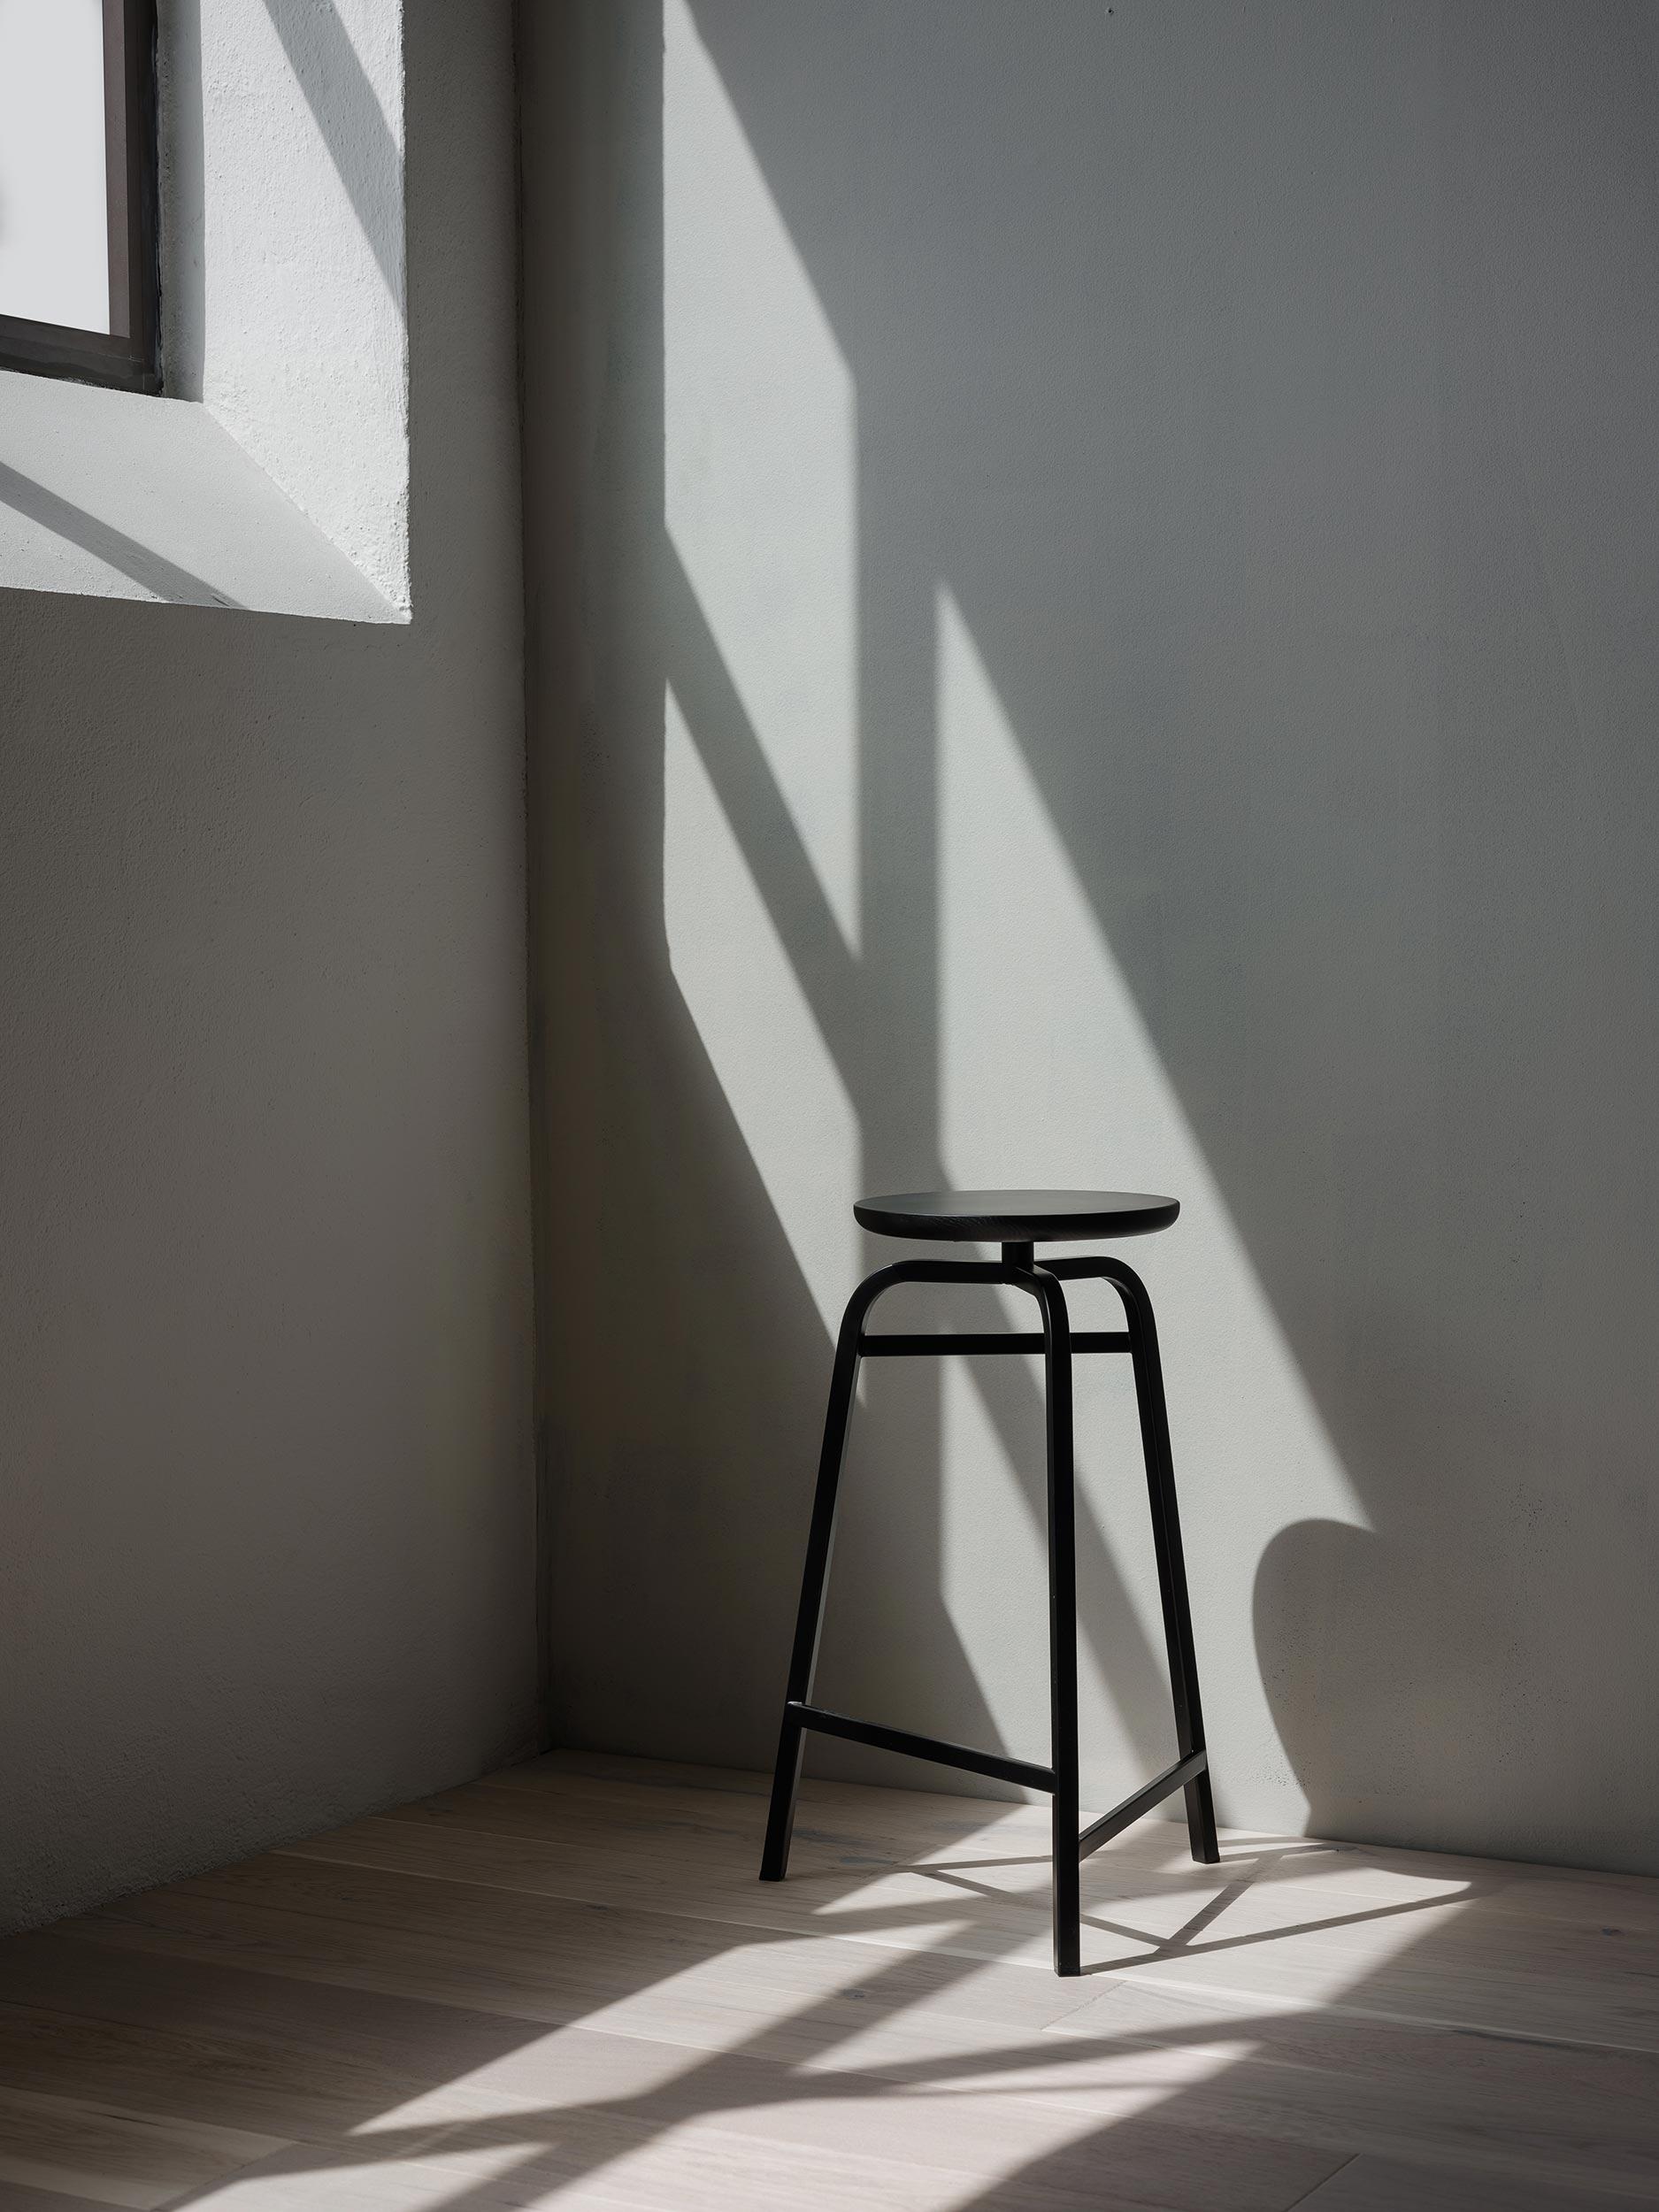 Treble_bar_stool_black_corner_Northern_Photo_Einar_Aslaksen_Low-res